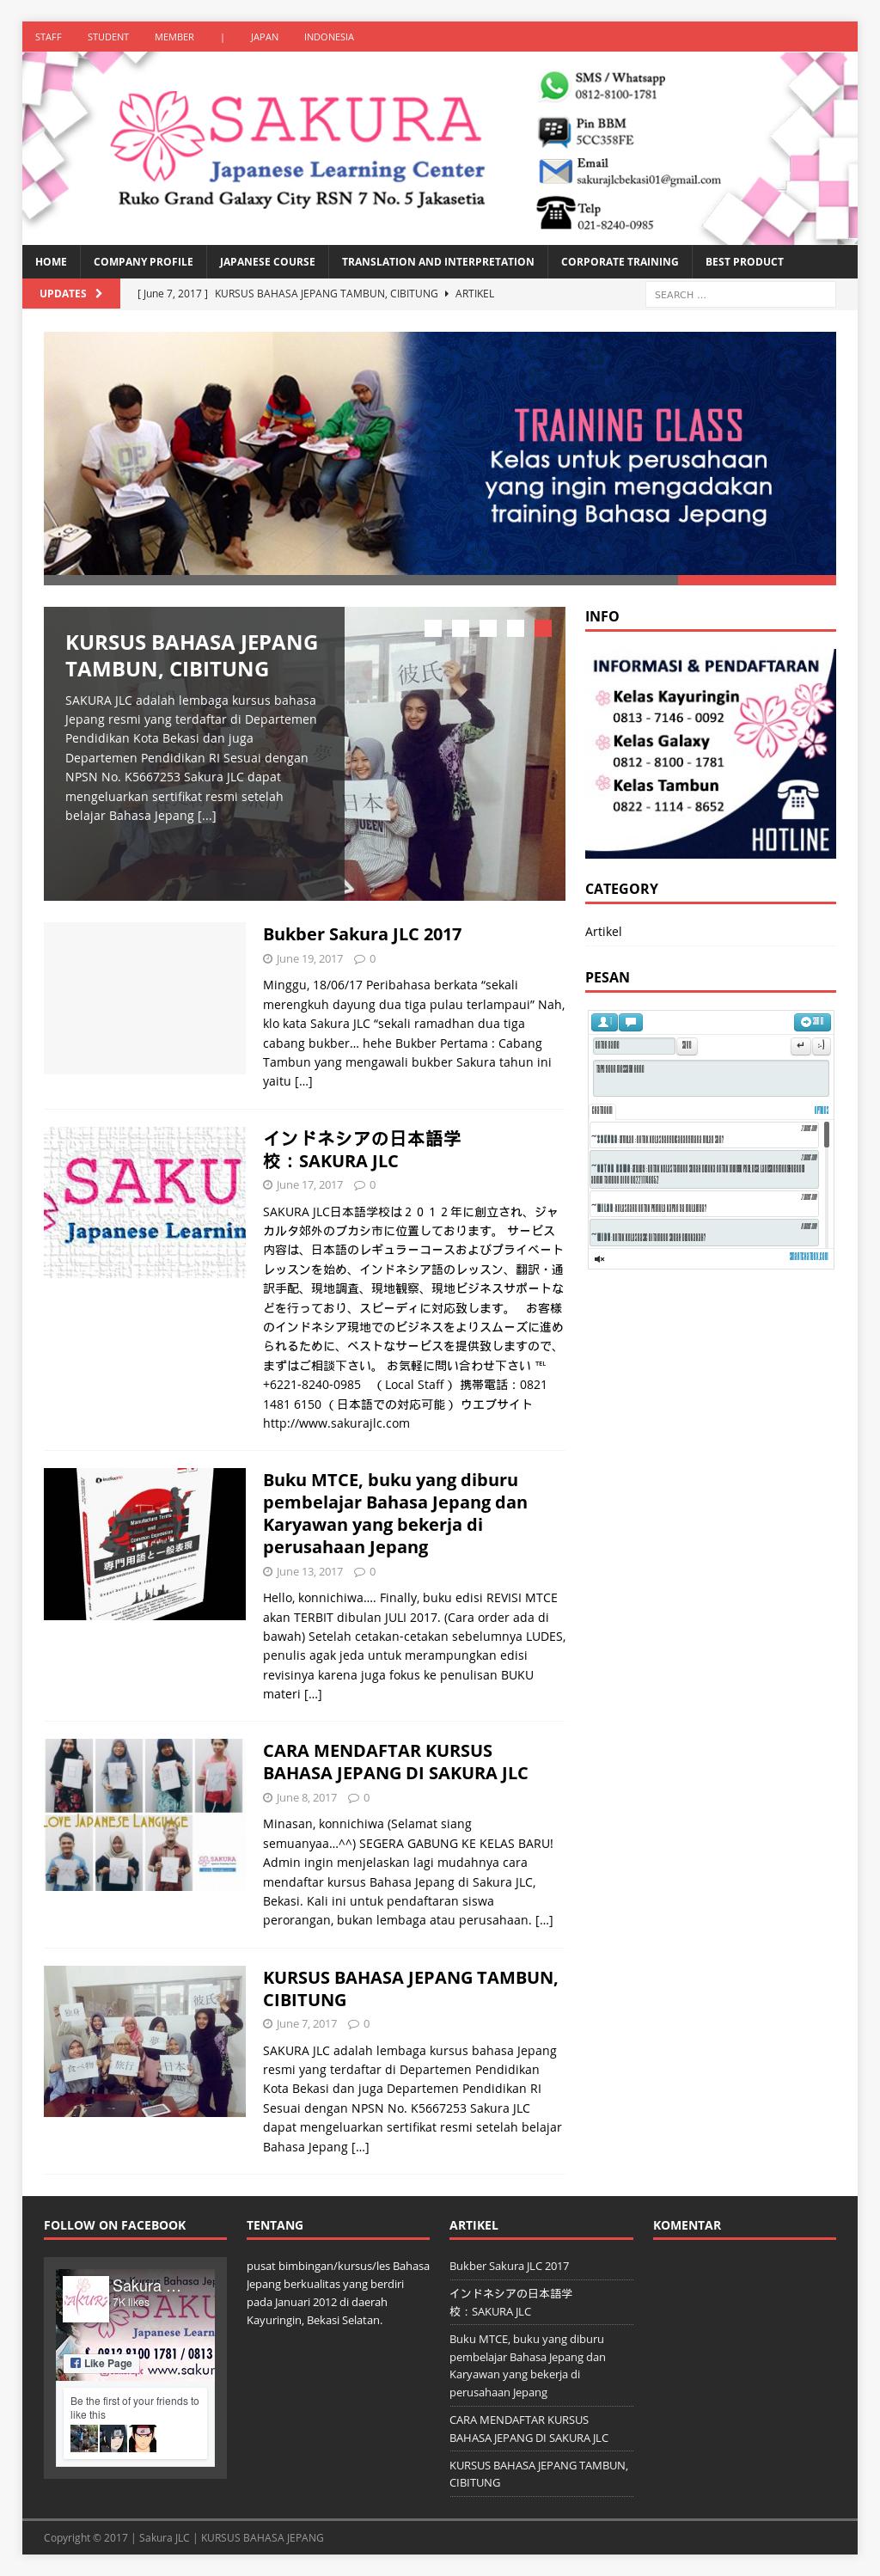 Kurs us bahasa jepang online dating